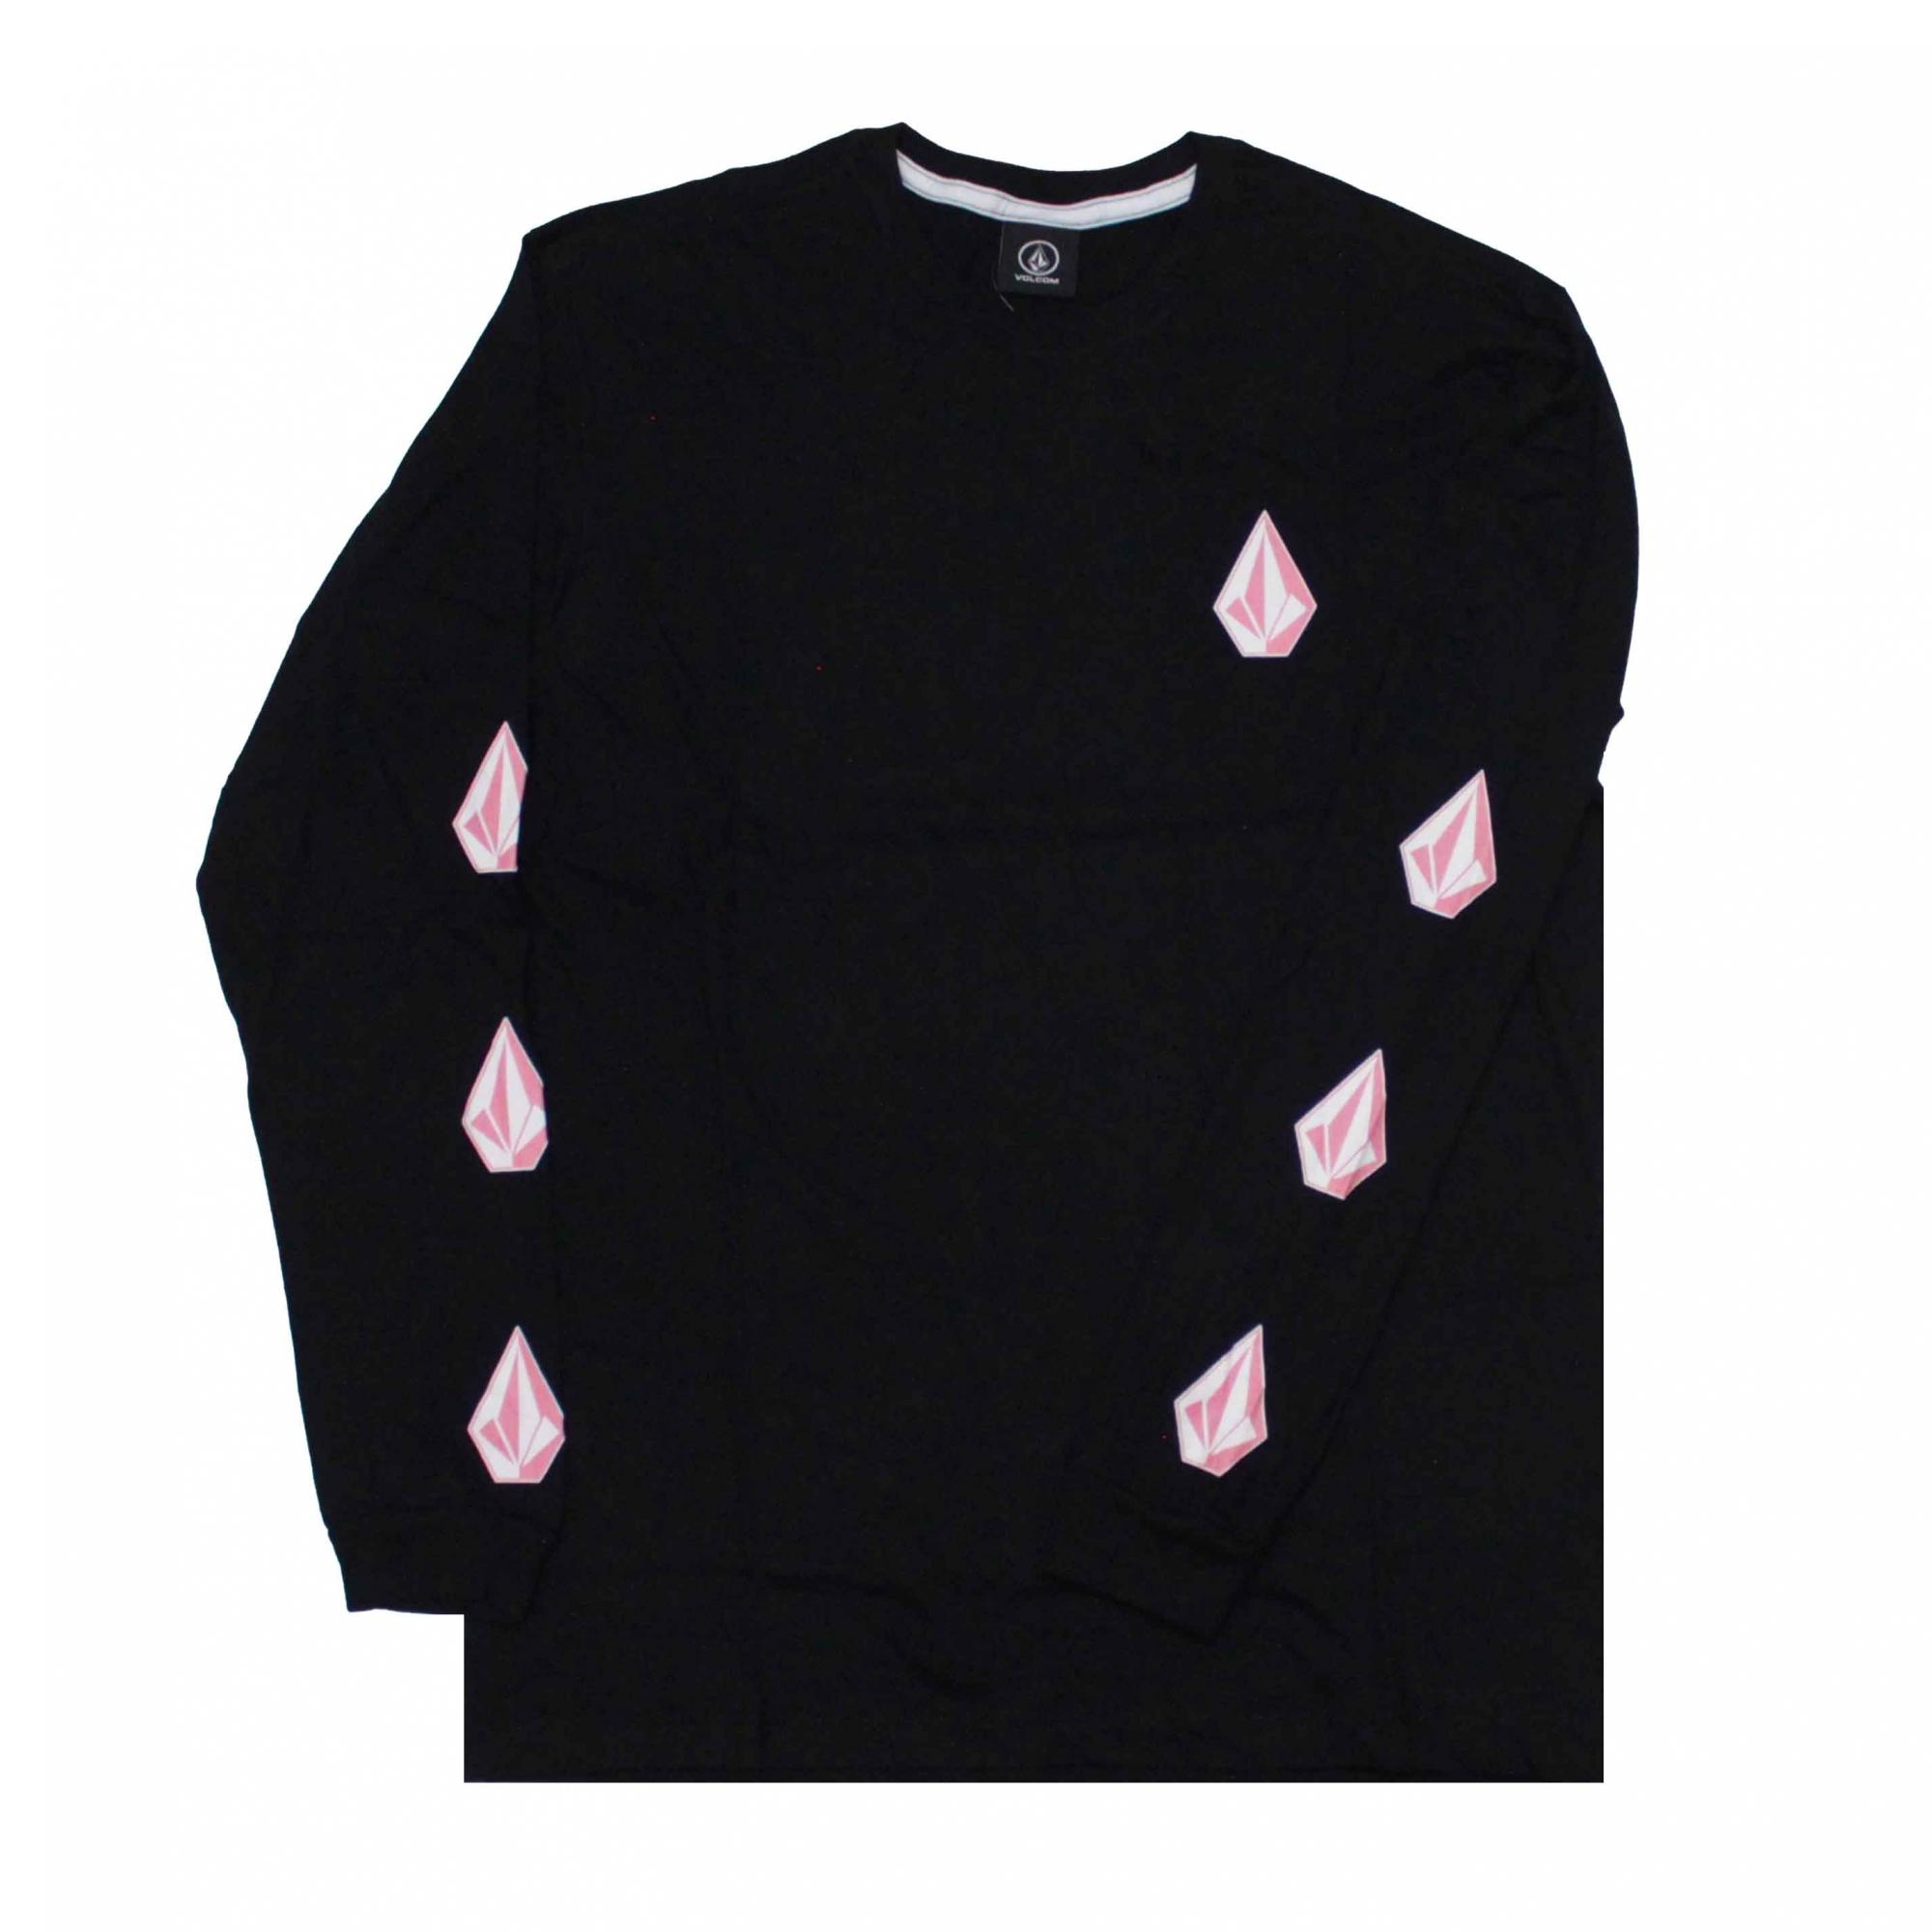 Camiseta Manga Longa Volcom Deadly Stones - Preto